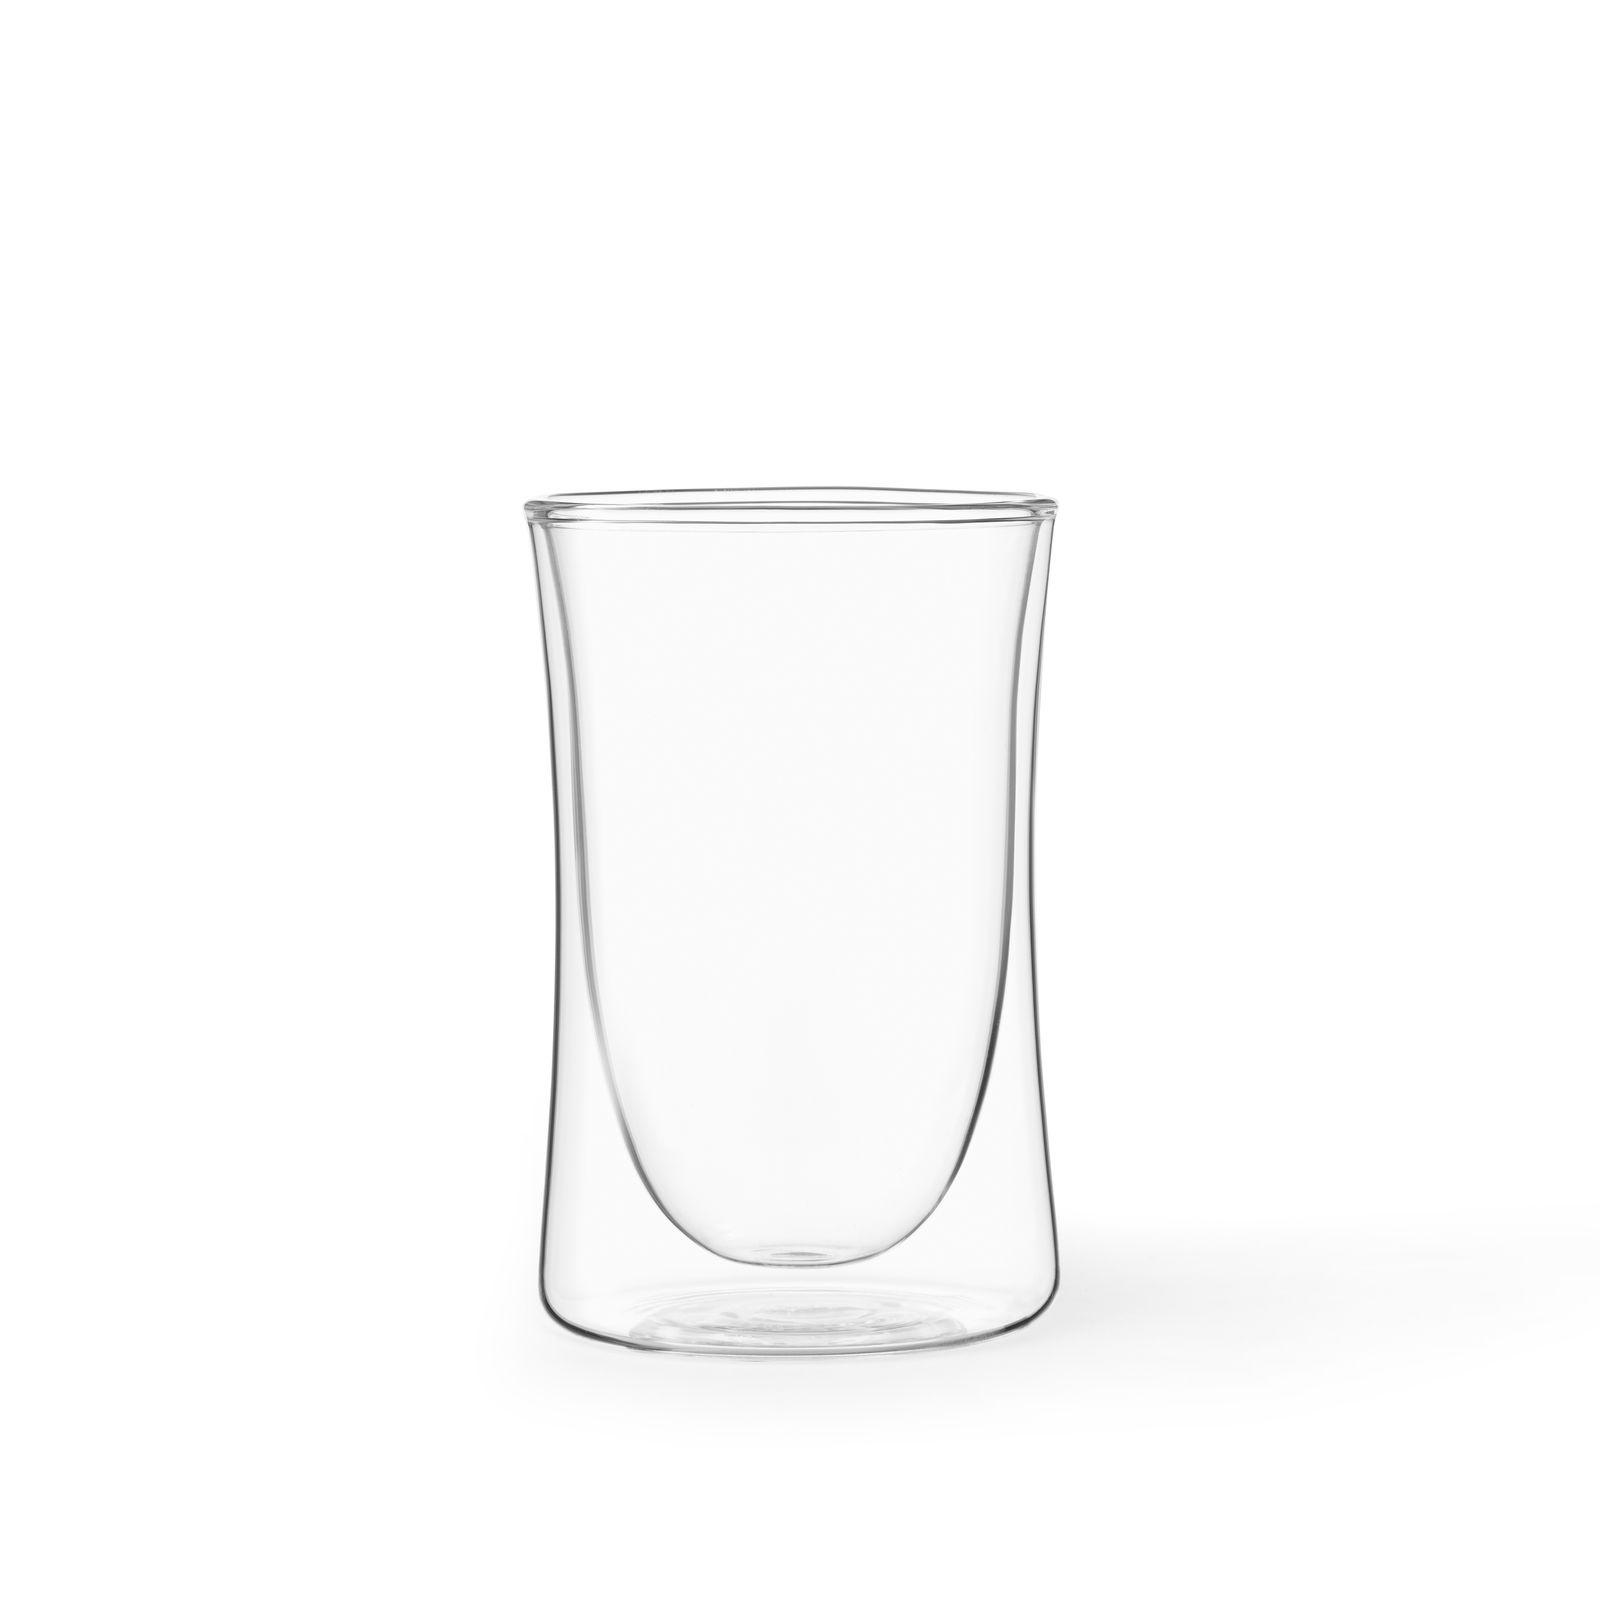 Viva Classic Curve Thermo Glas 400 ml Set van 2 Stuks